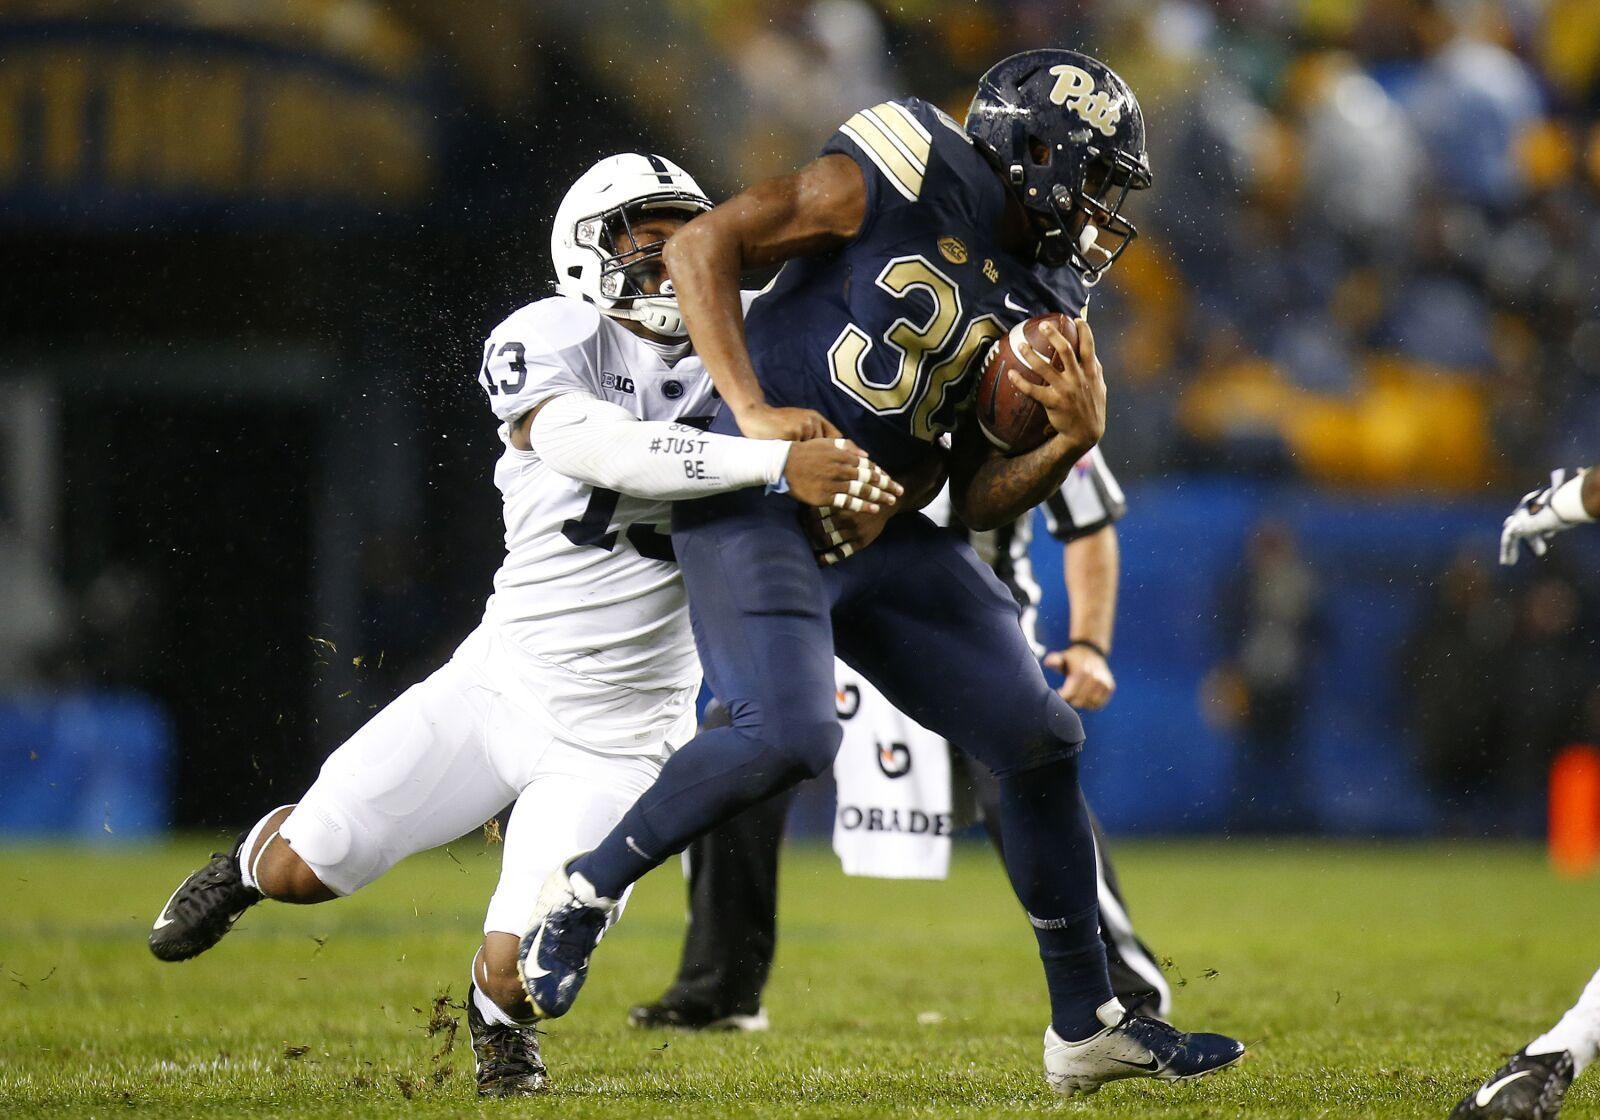 Penn State Football: Sophomore linebacker group one of the best